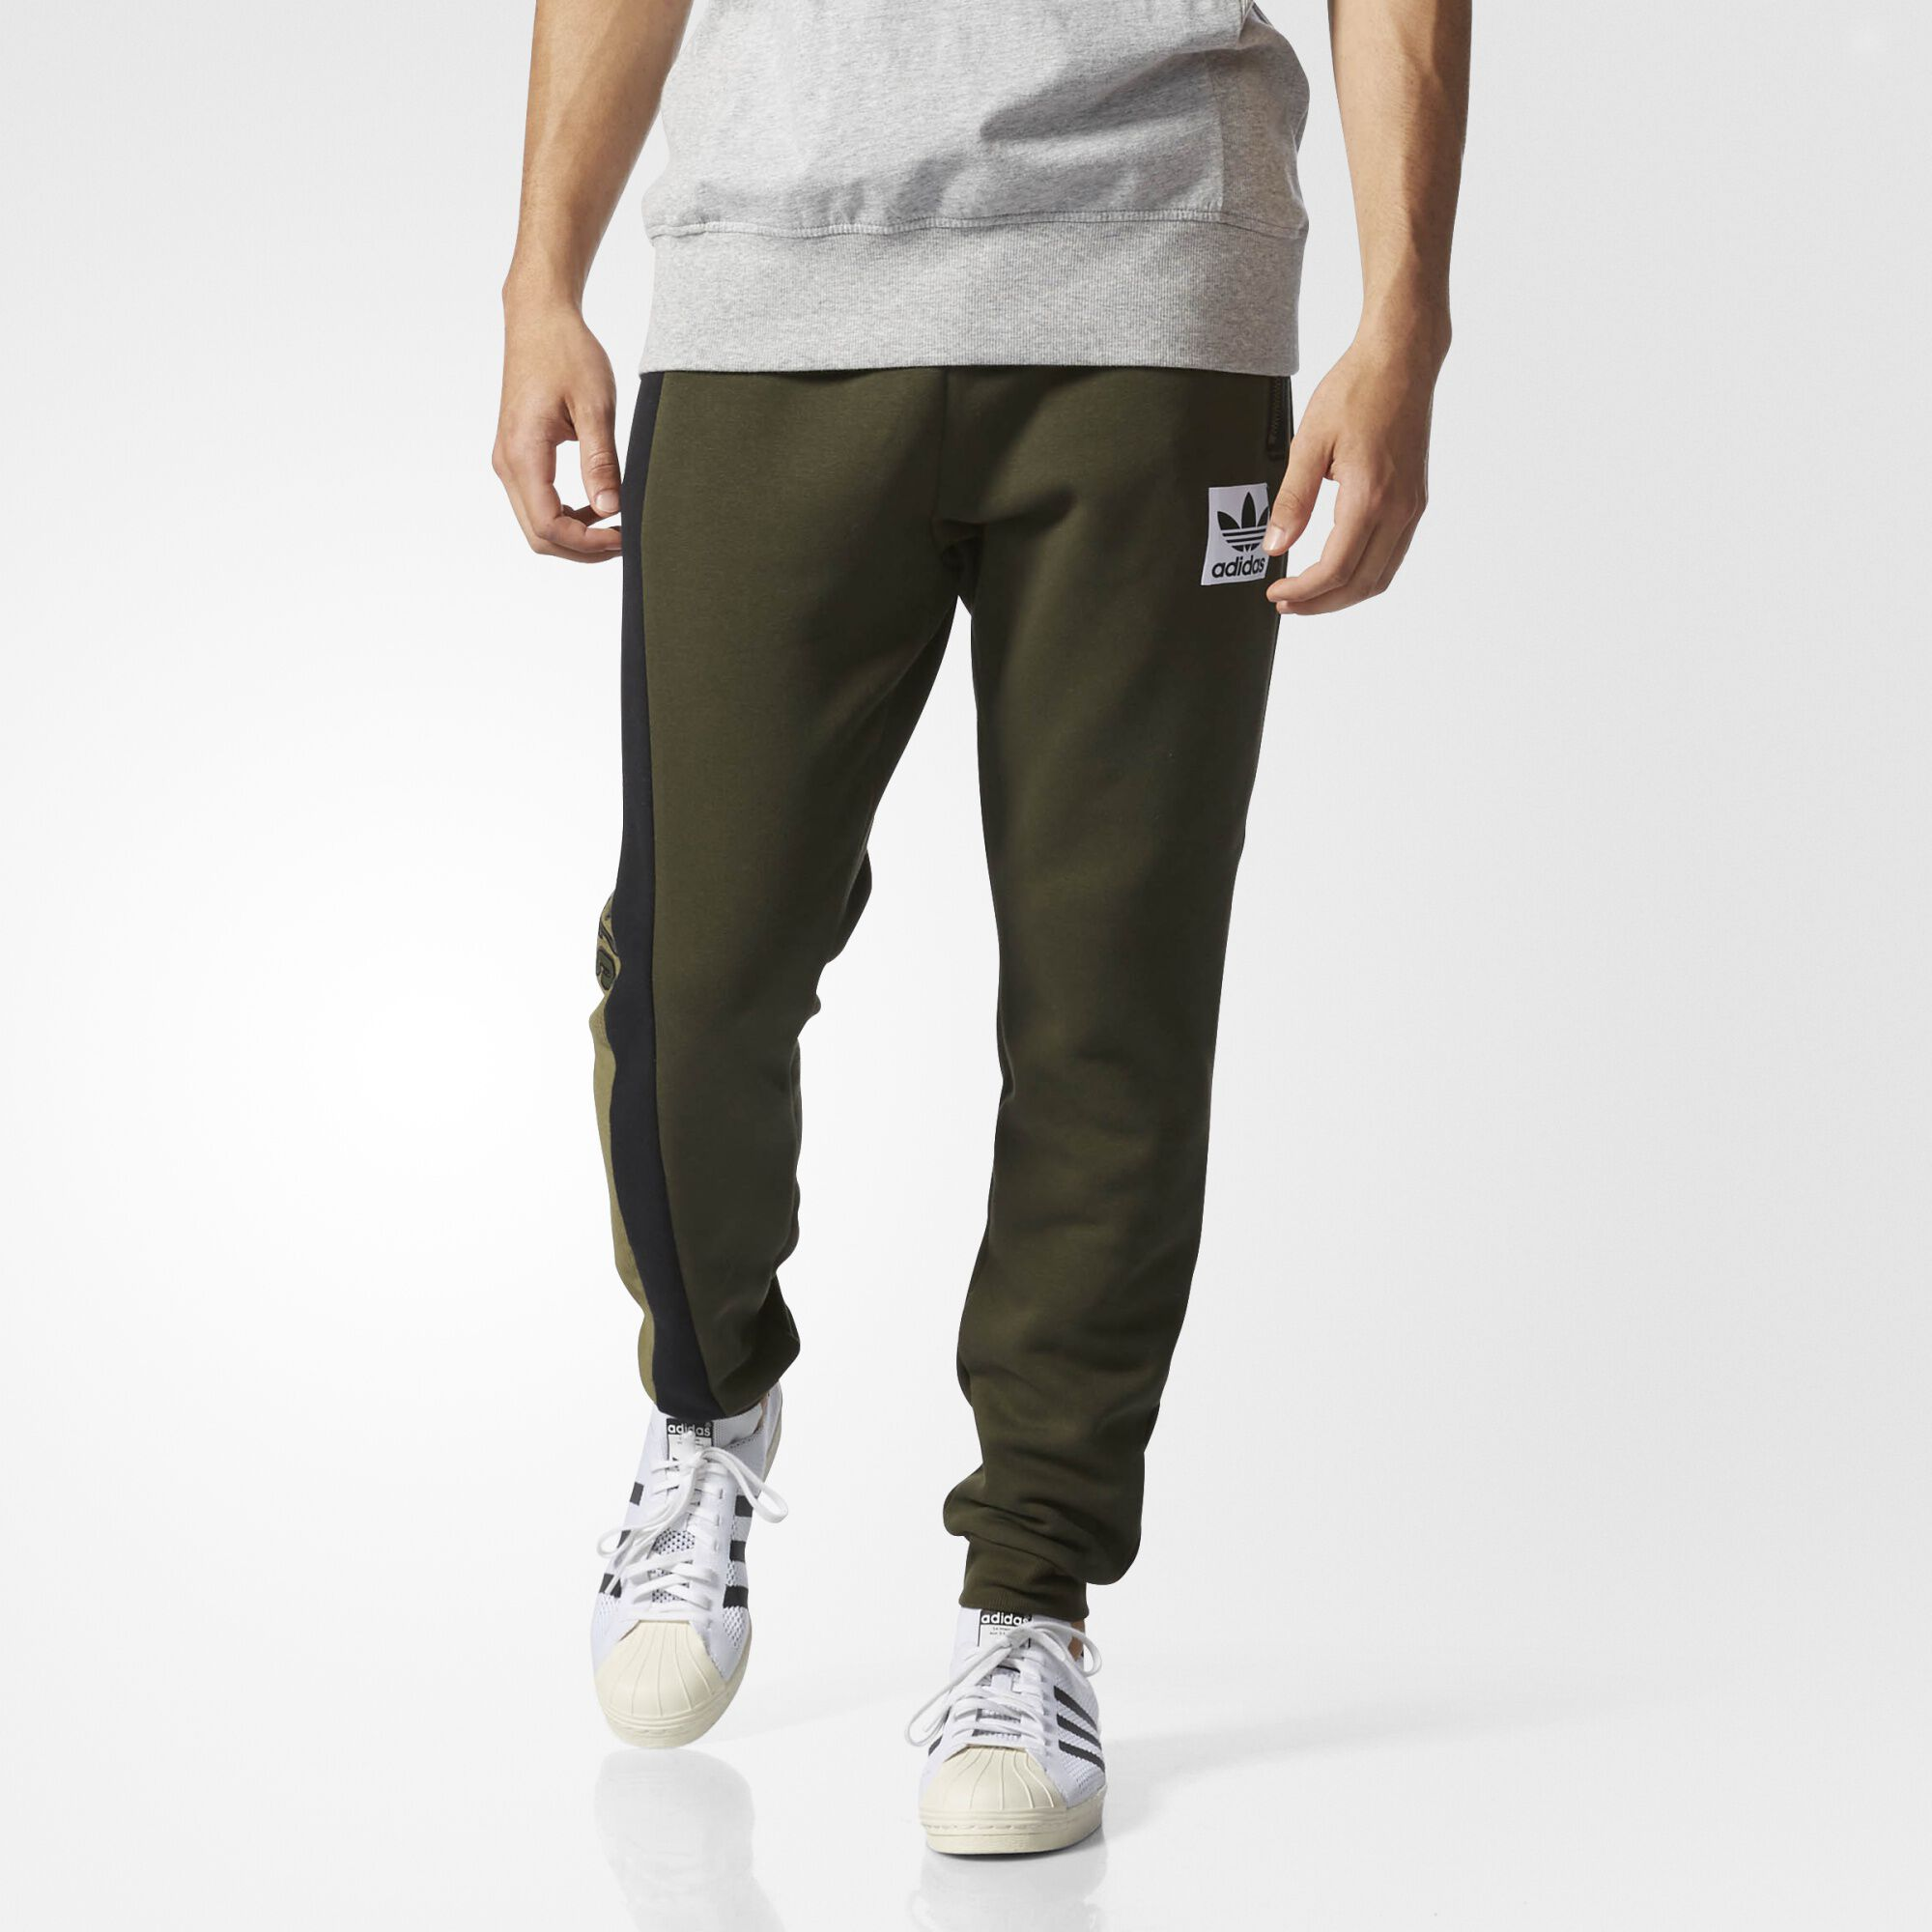 buy adidas clothing adidas shop online